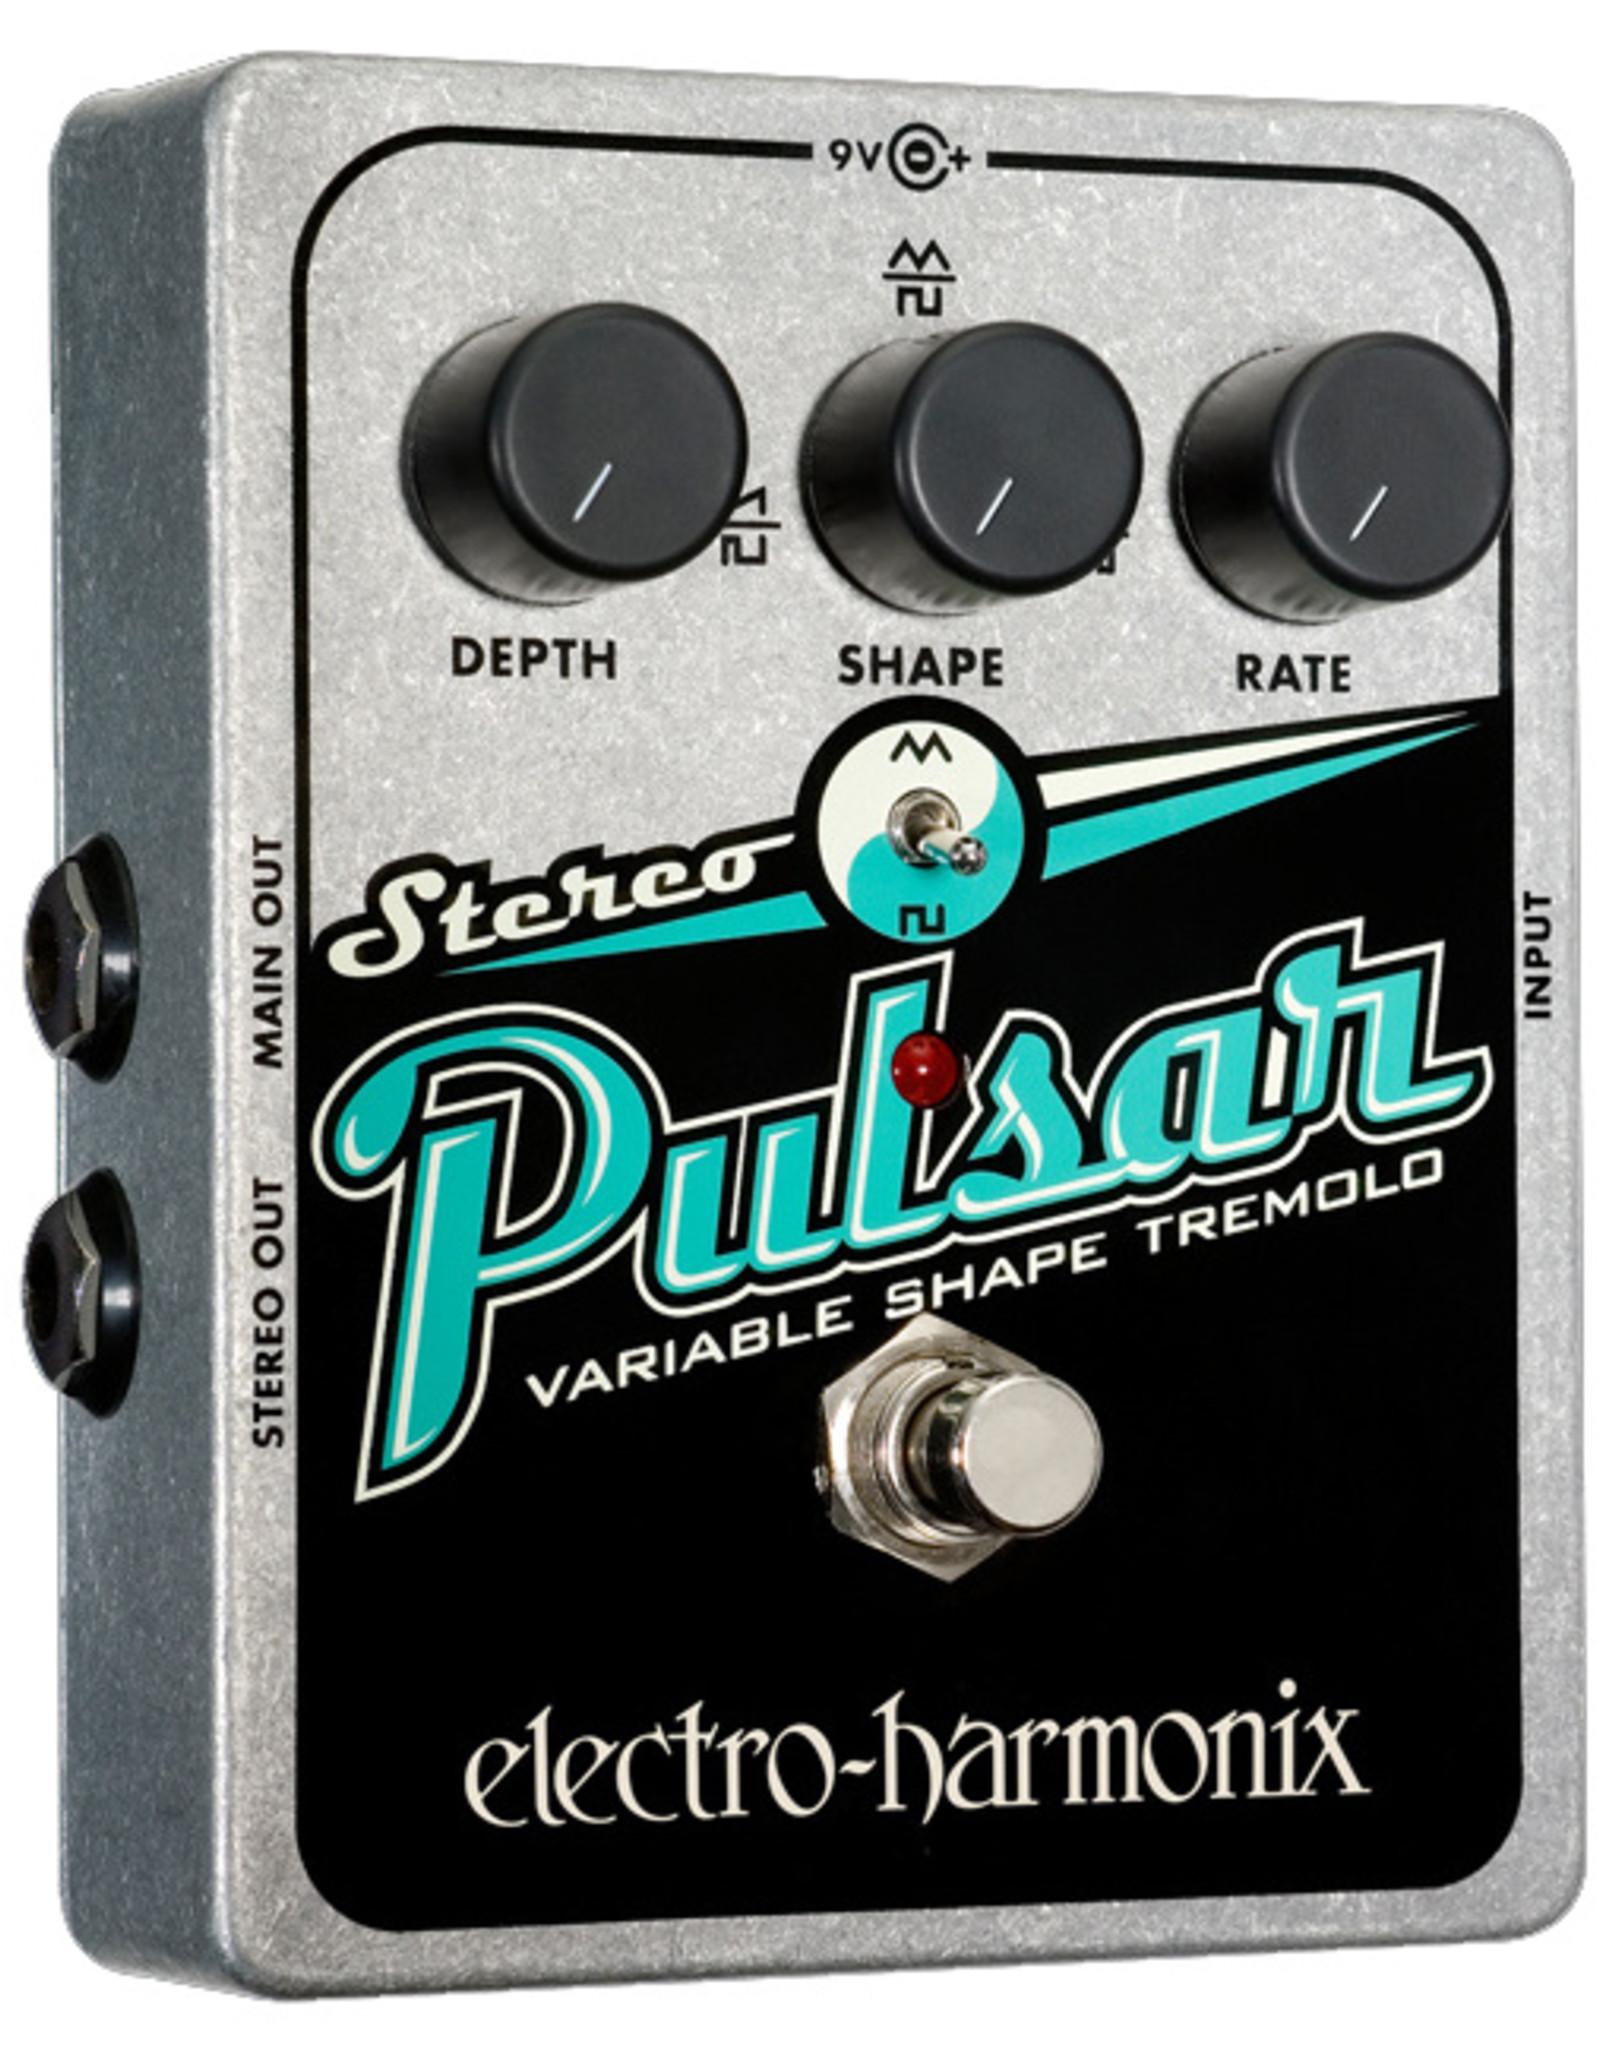 Electro-Harmonix EHX Stereo Pulsar Variable Shape Analog Tremolo Battery included, 9.6DC-200 PSU optional